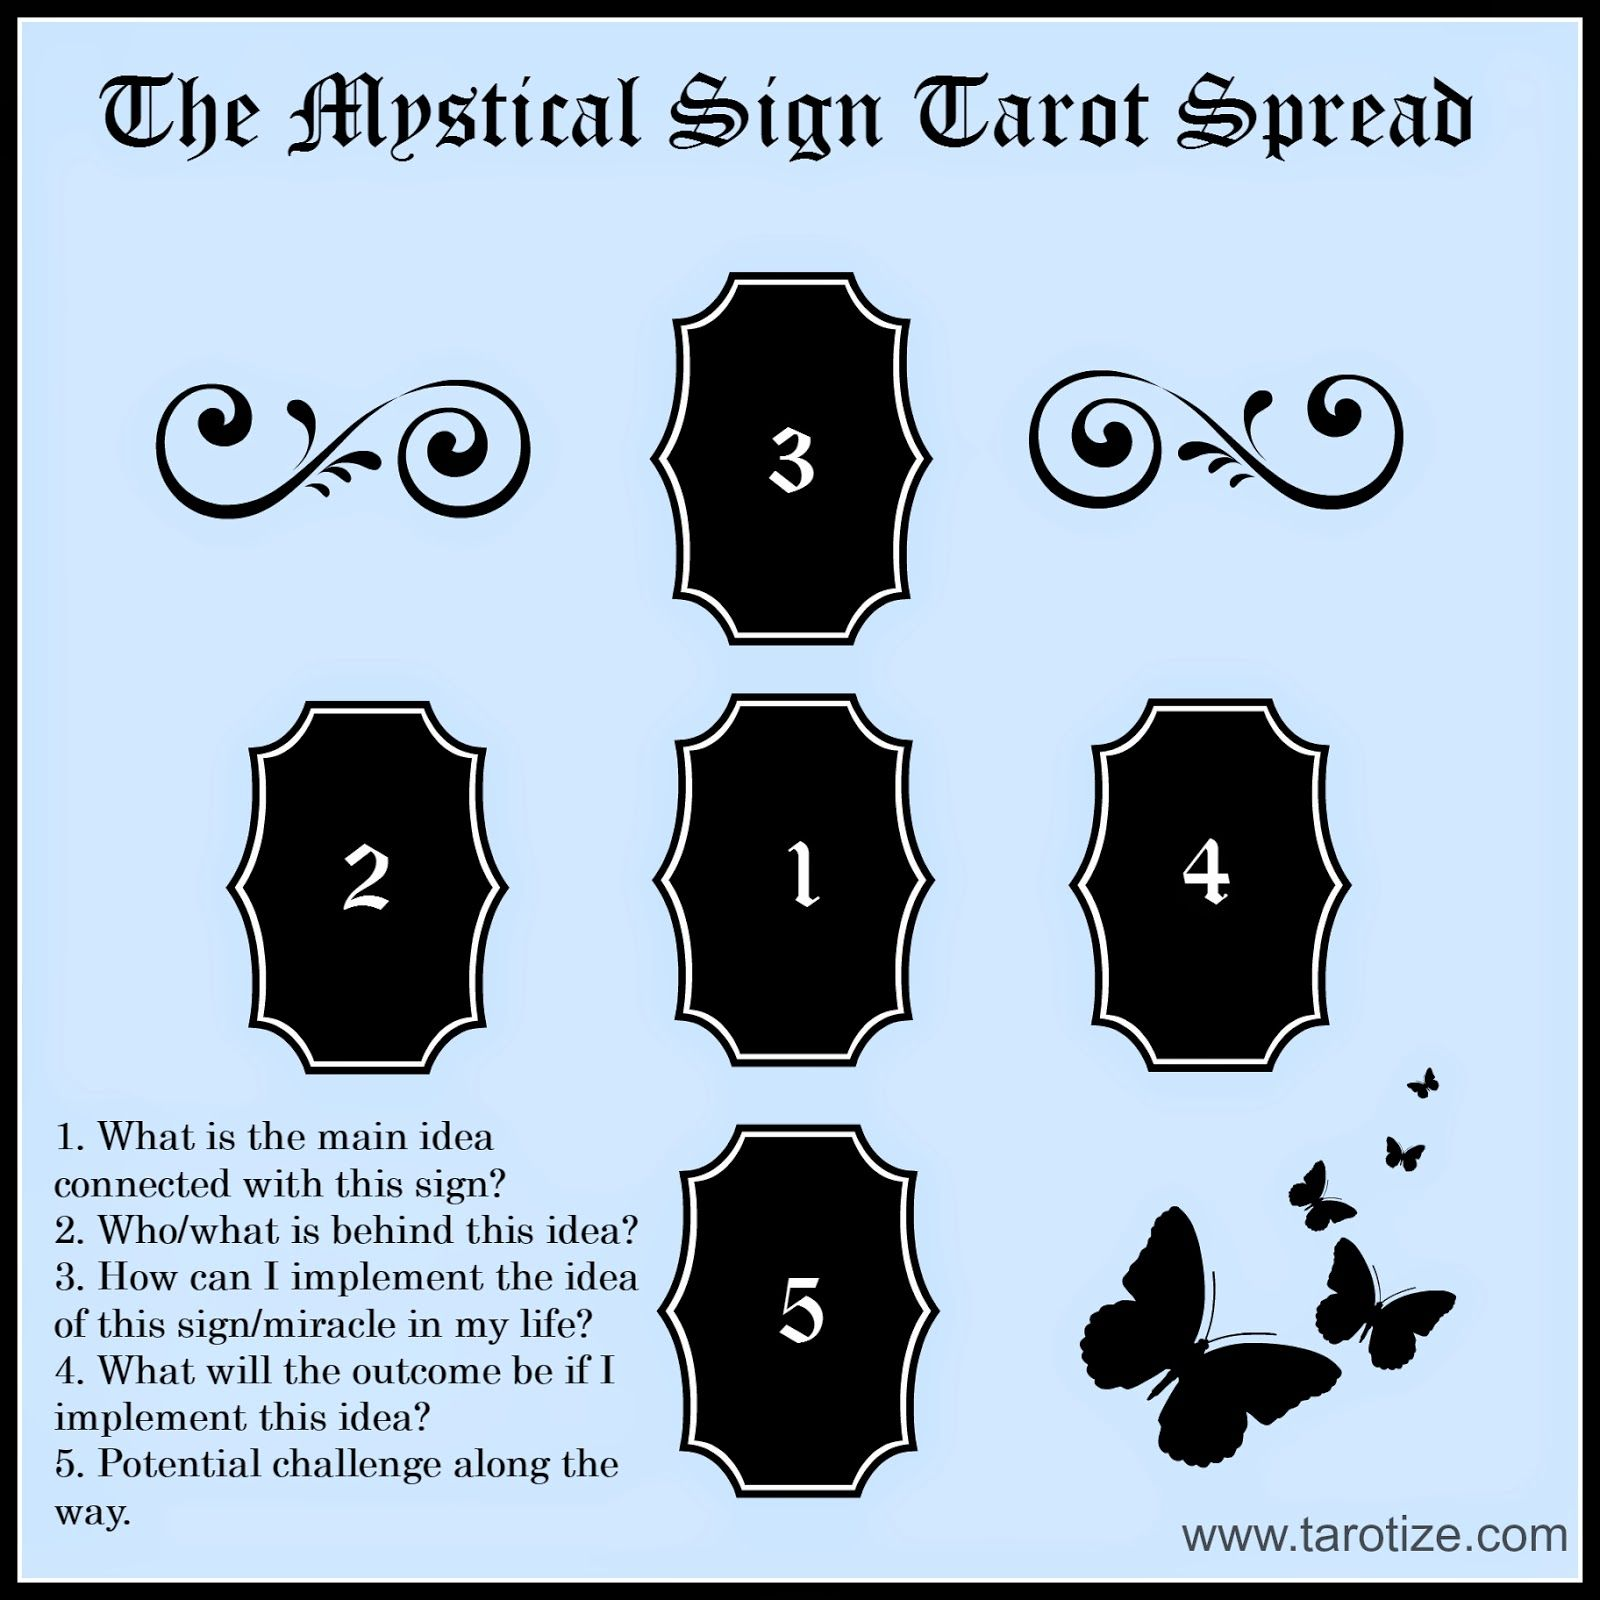 Tarotize - Holistic Tarot: The Mystical Sign Tarot Spread